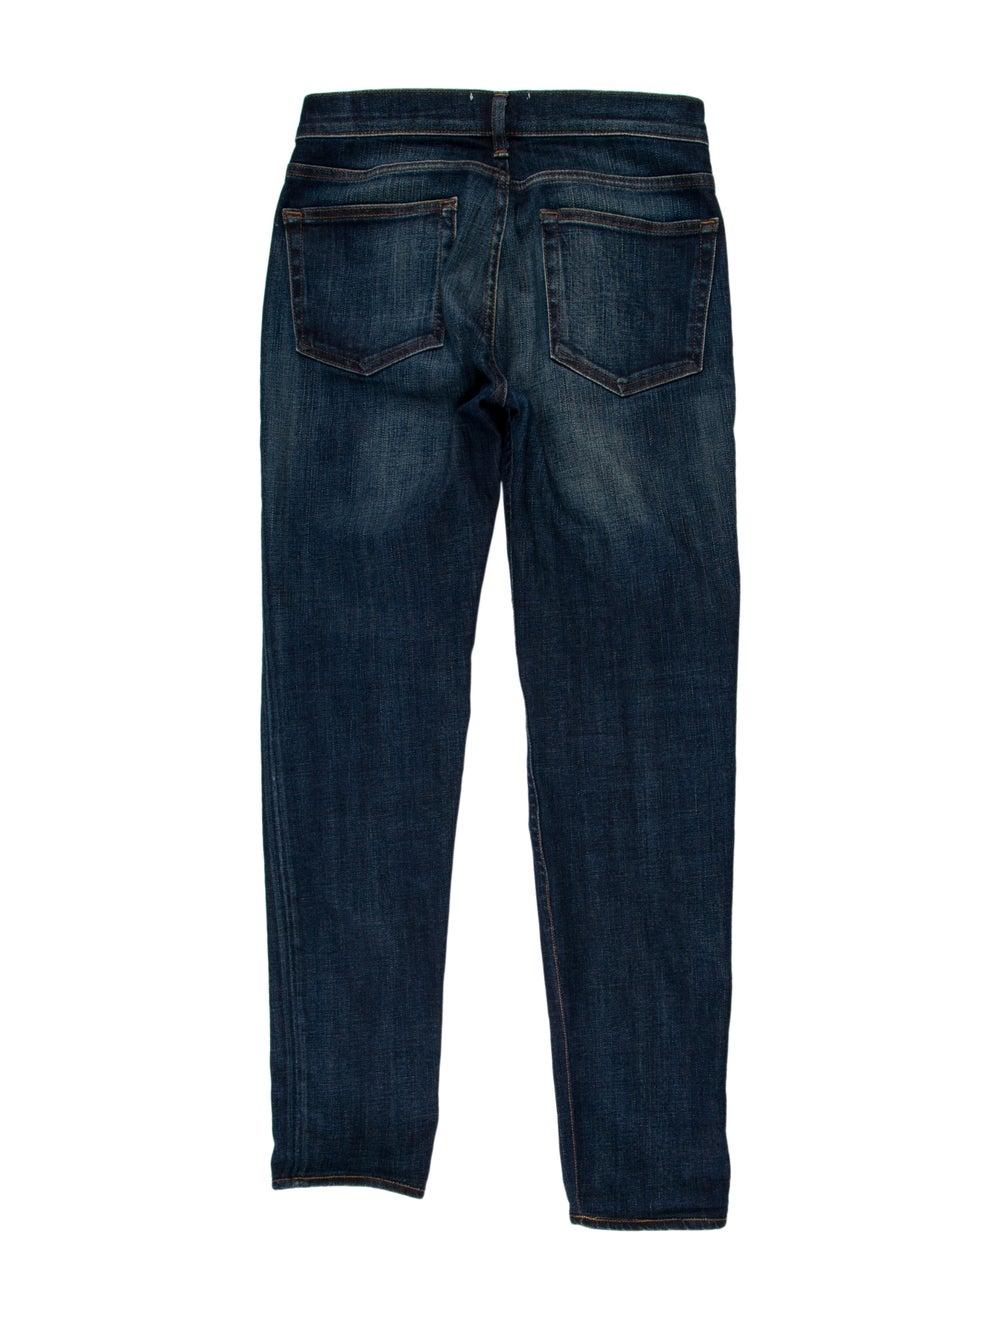 Acne Studios Skinny Jeans blue - image 2